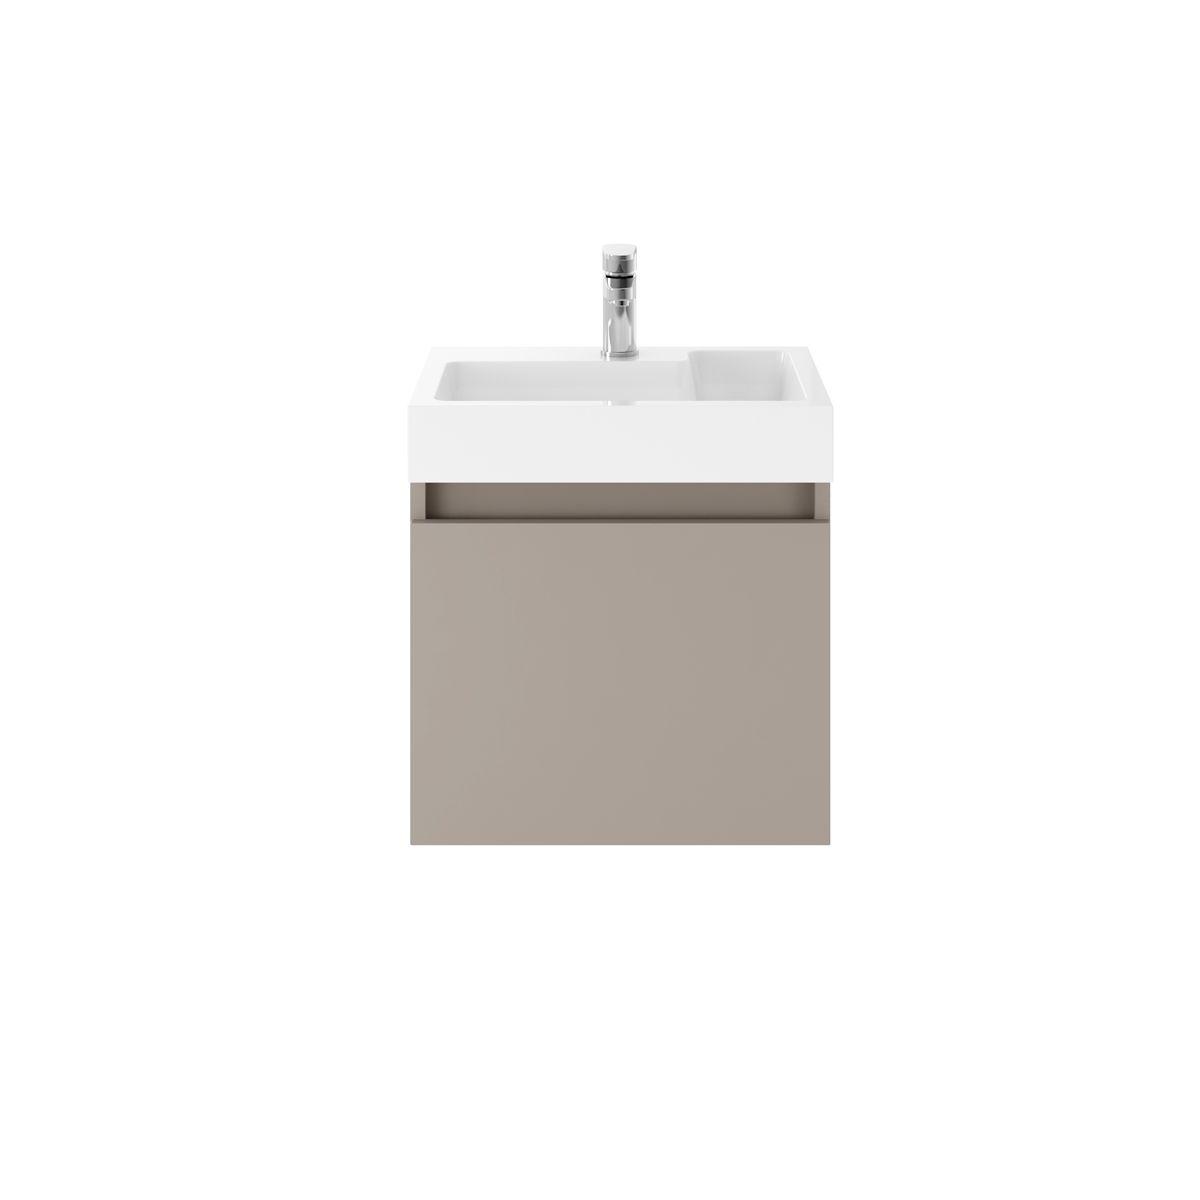 Nuie Merit Stone Grey Wall Hung Vanity Unit 500mm